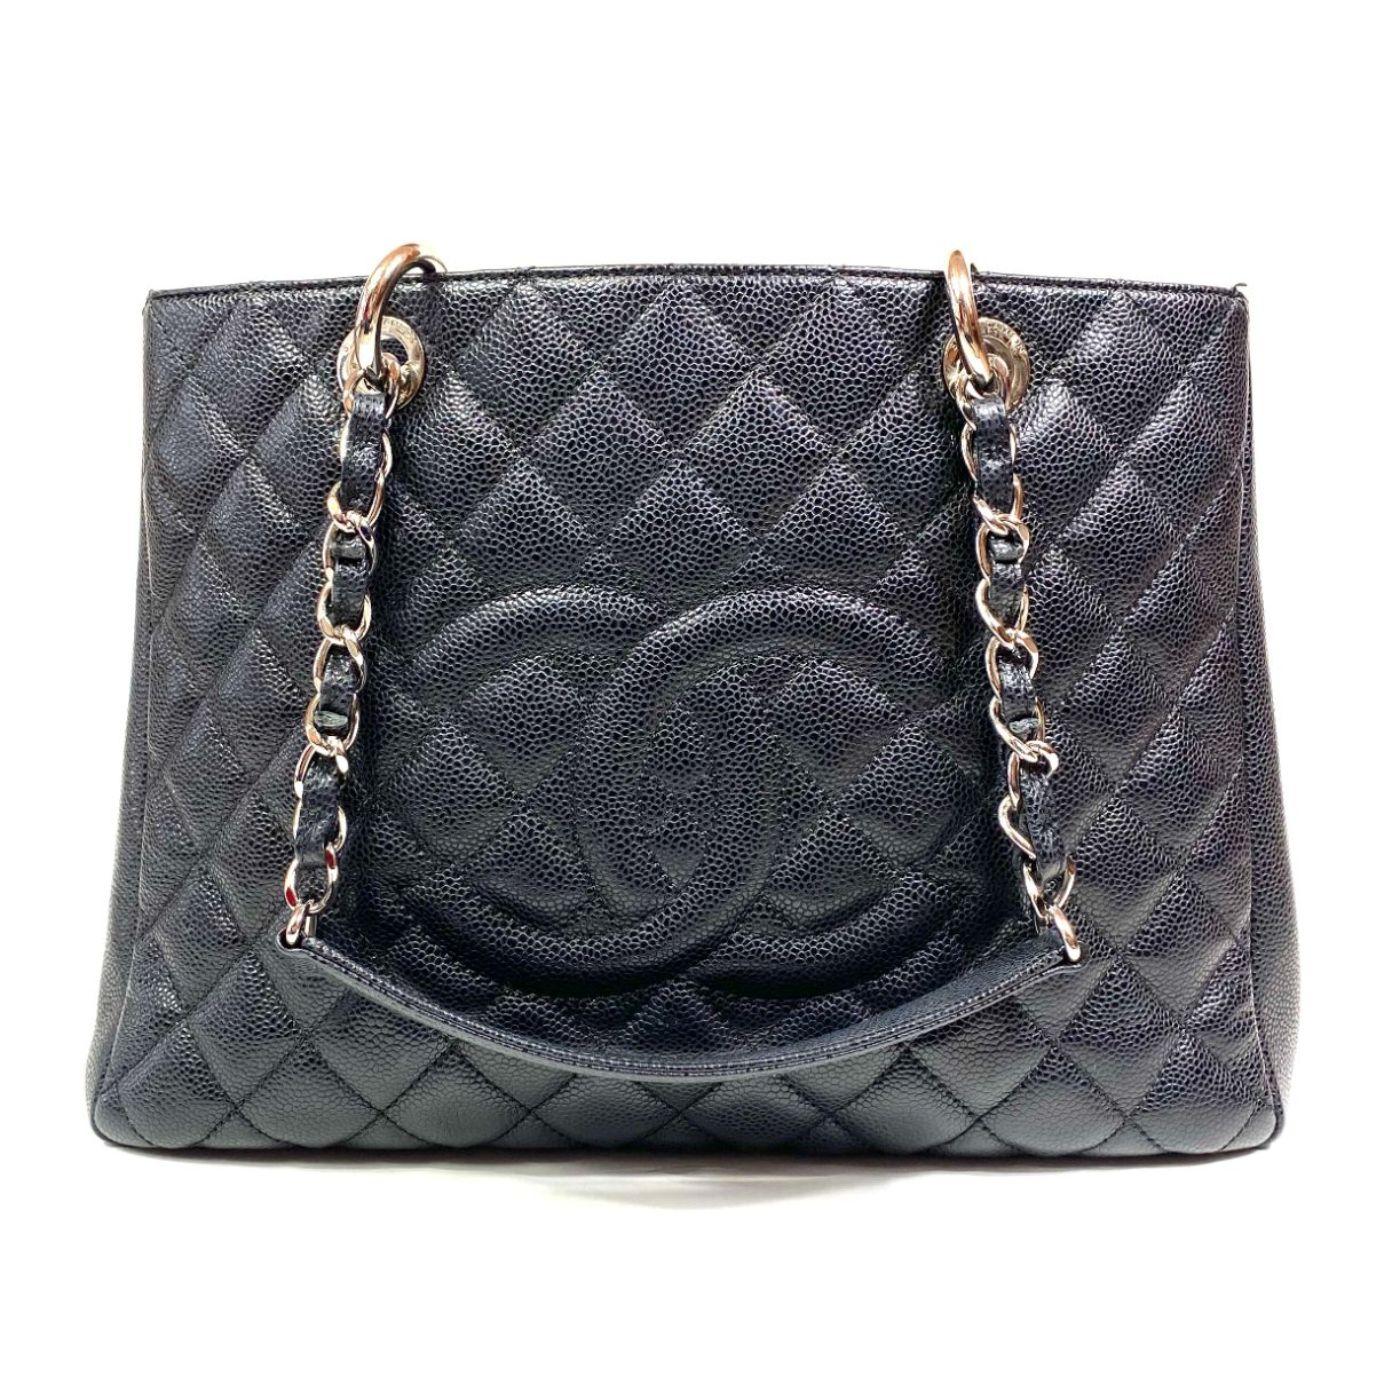 Bolsa Chanel Shopper Matelassê Preta